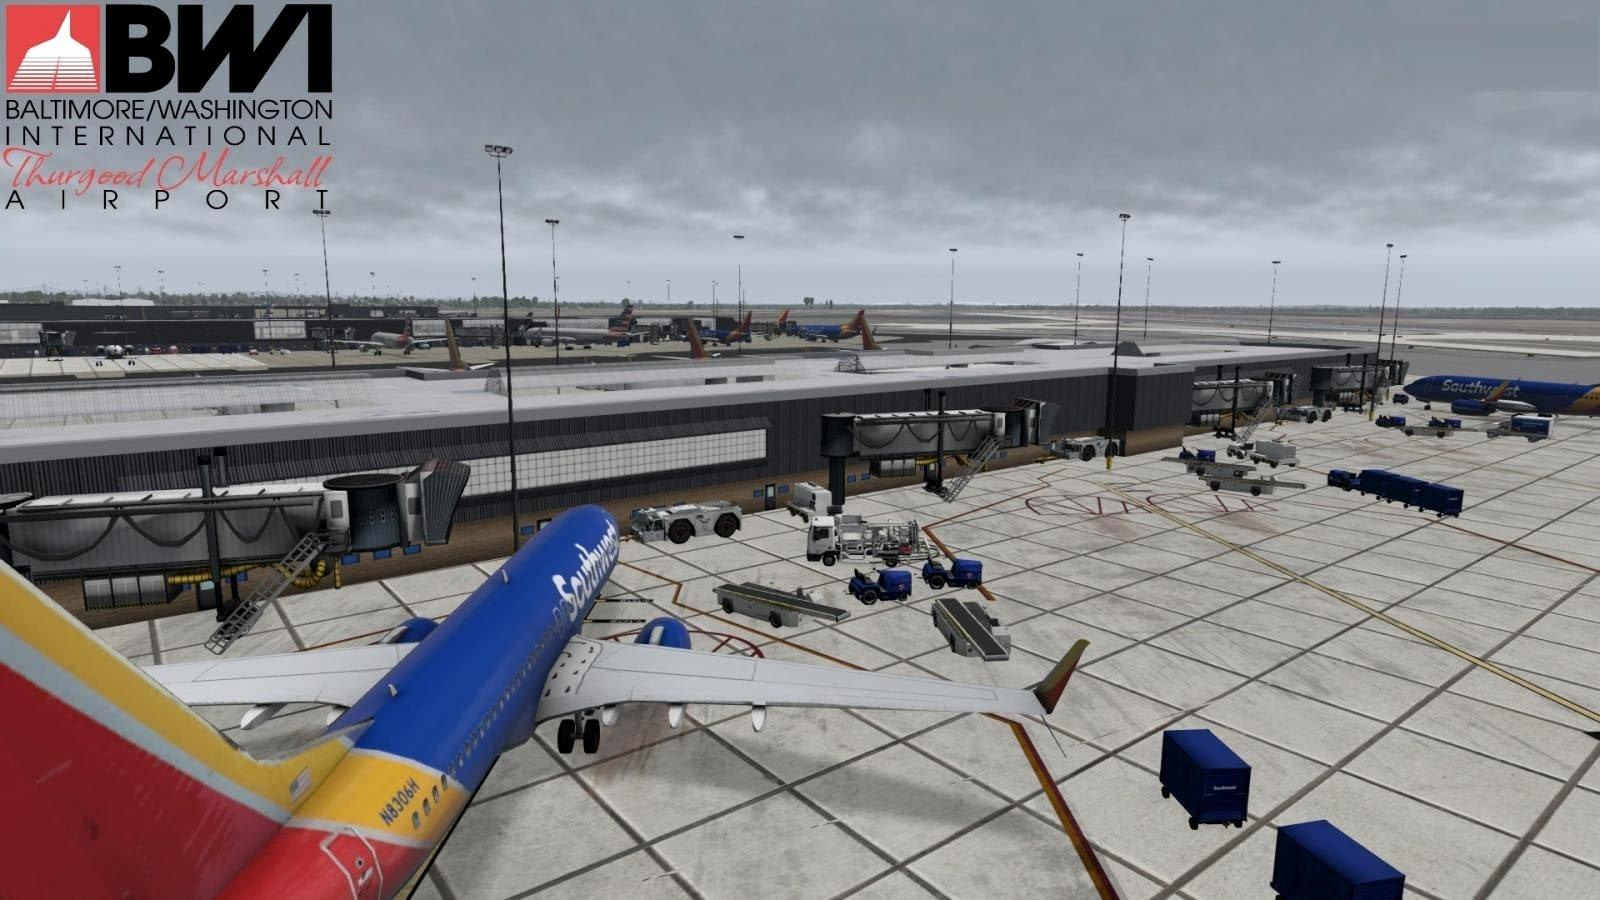 KBWI Baltimore Washington International Airport - News - X-Plane Org